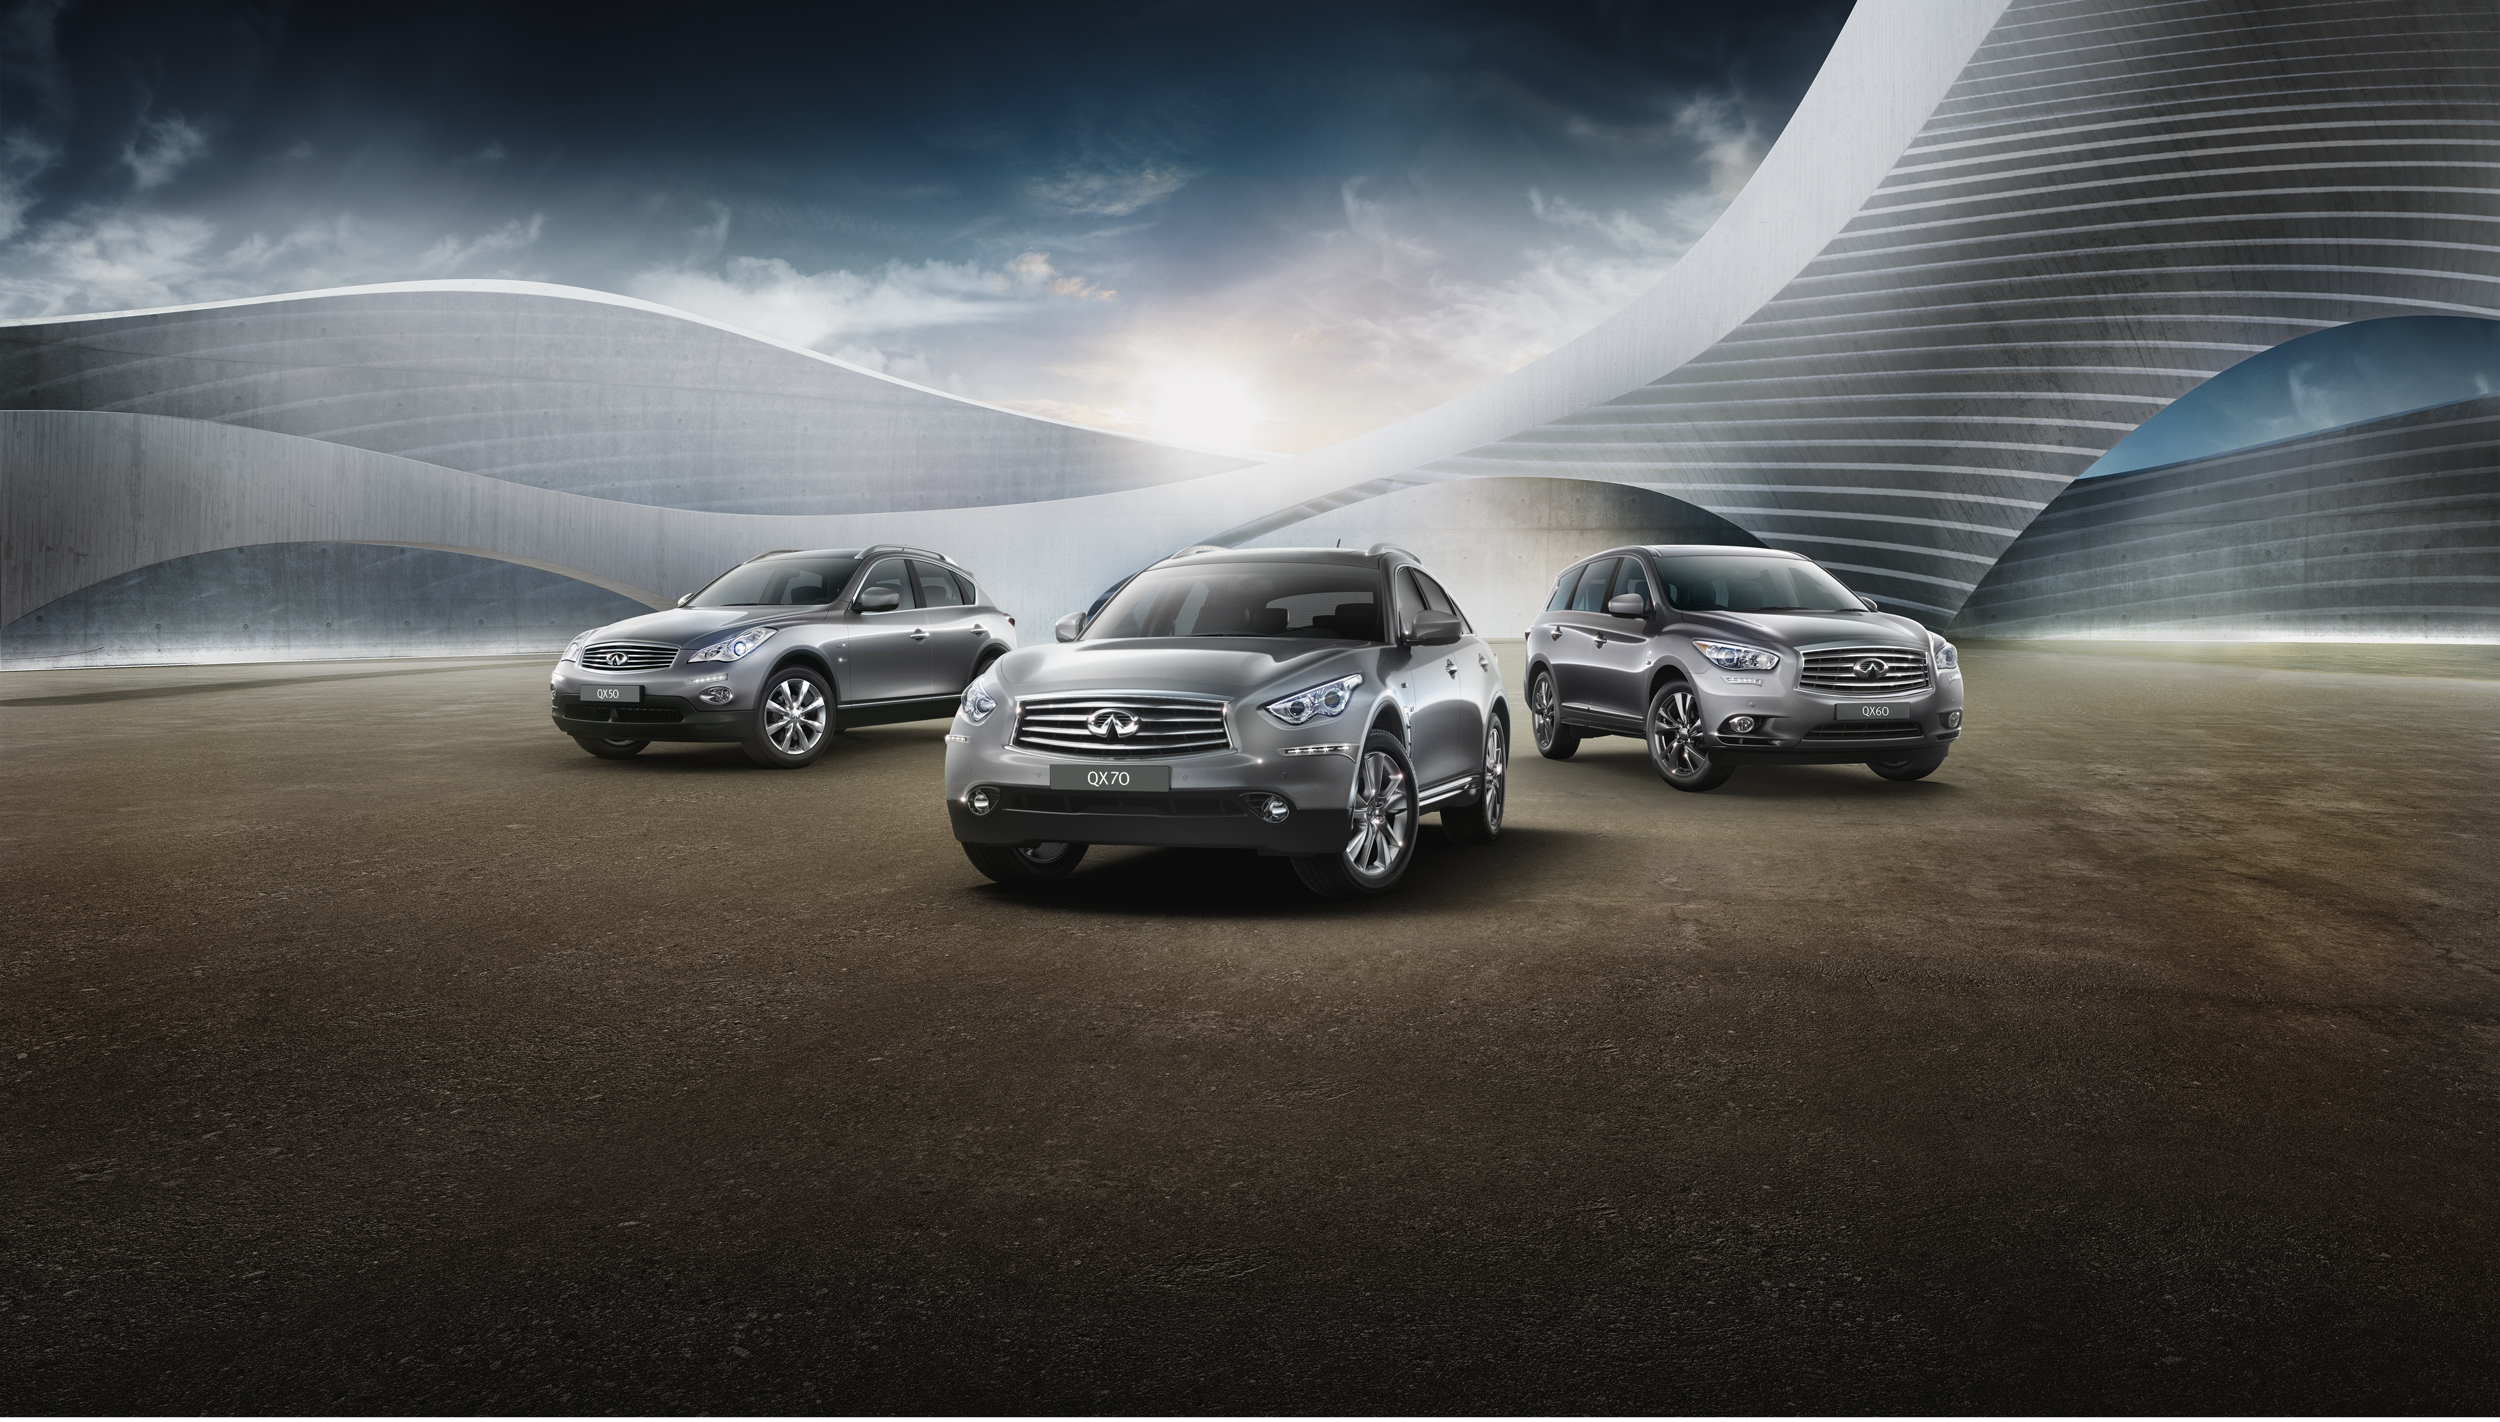 Arabian Automobiles Company Infiniti SUV line up.jpg